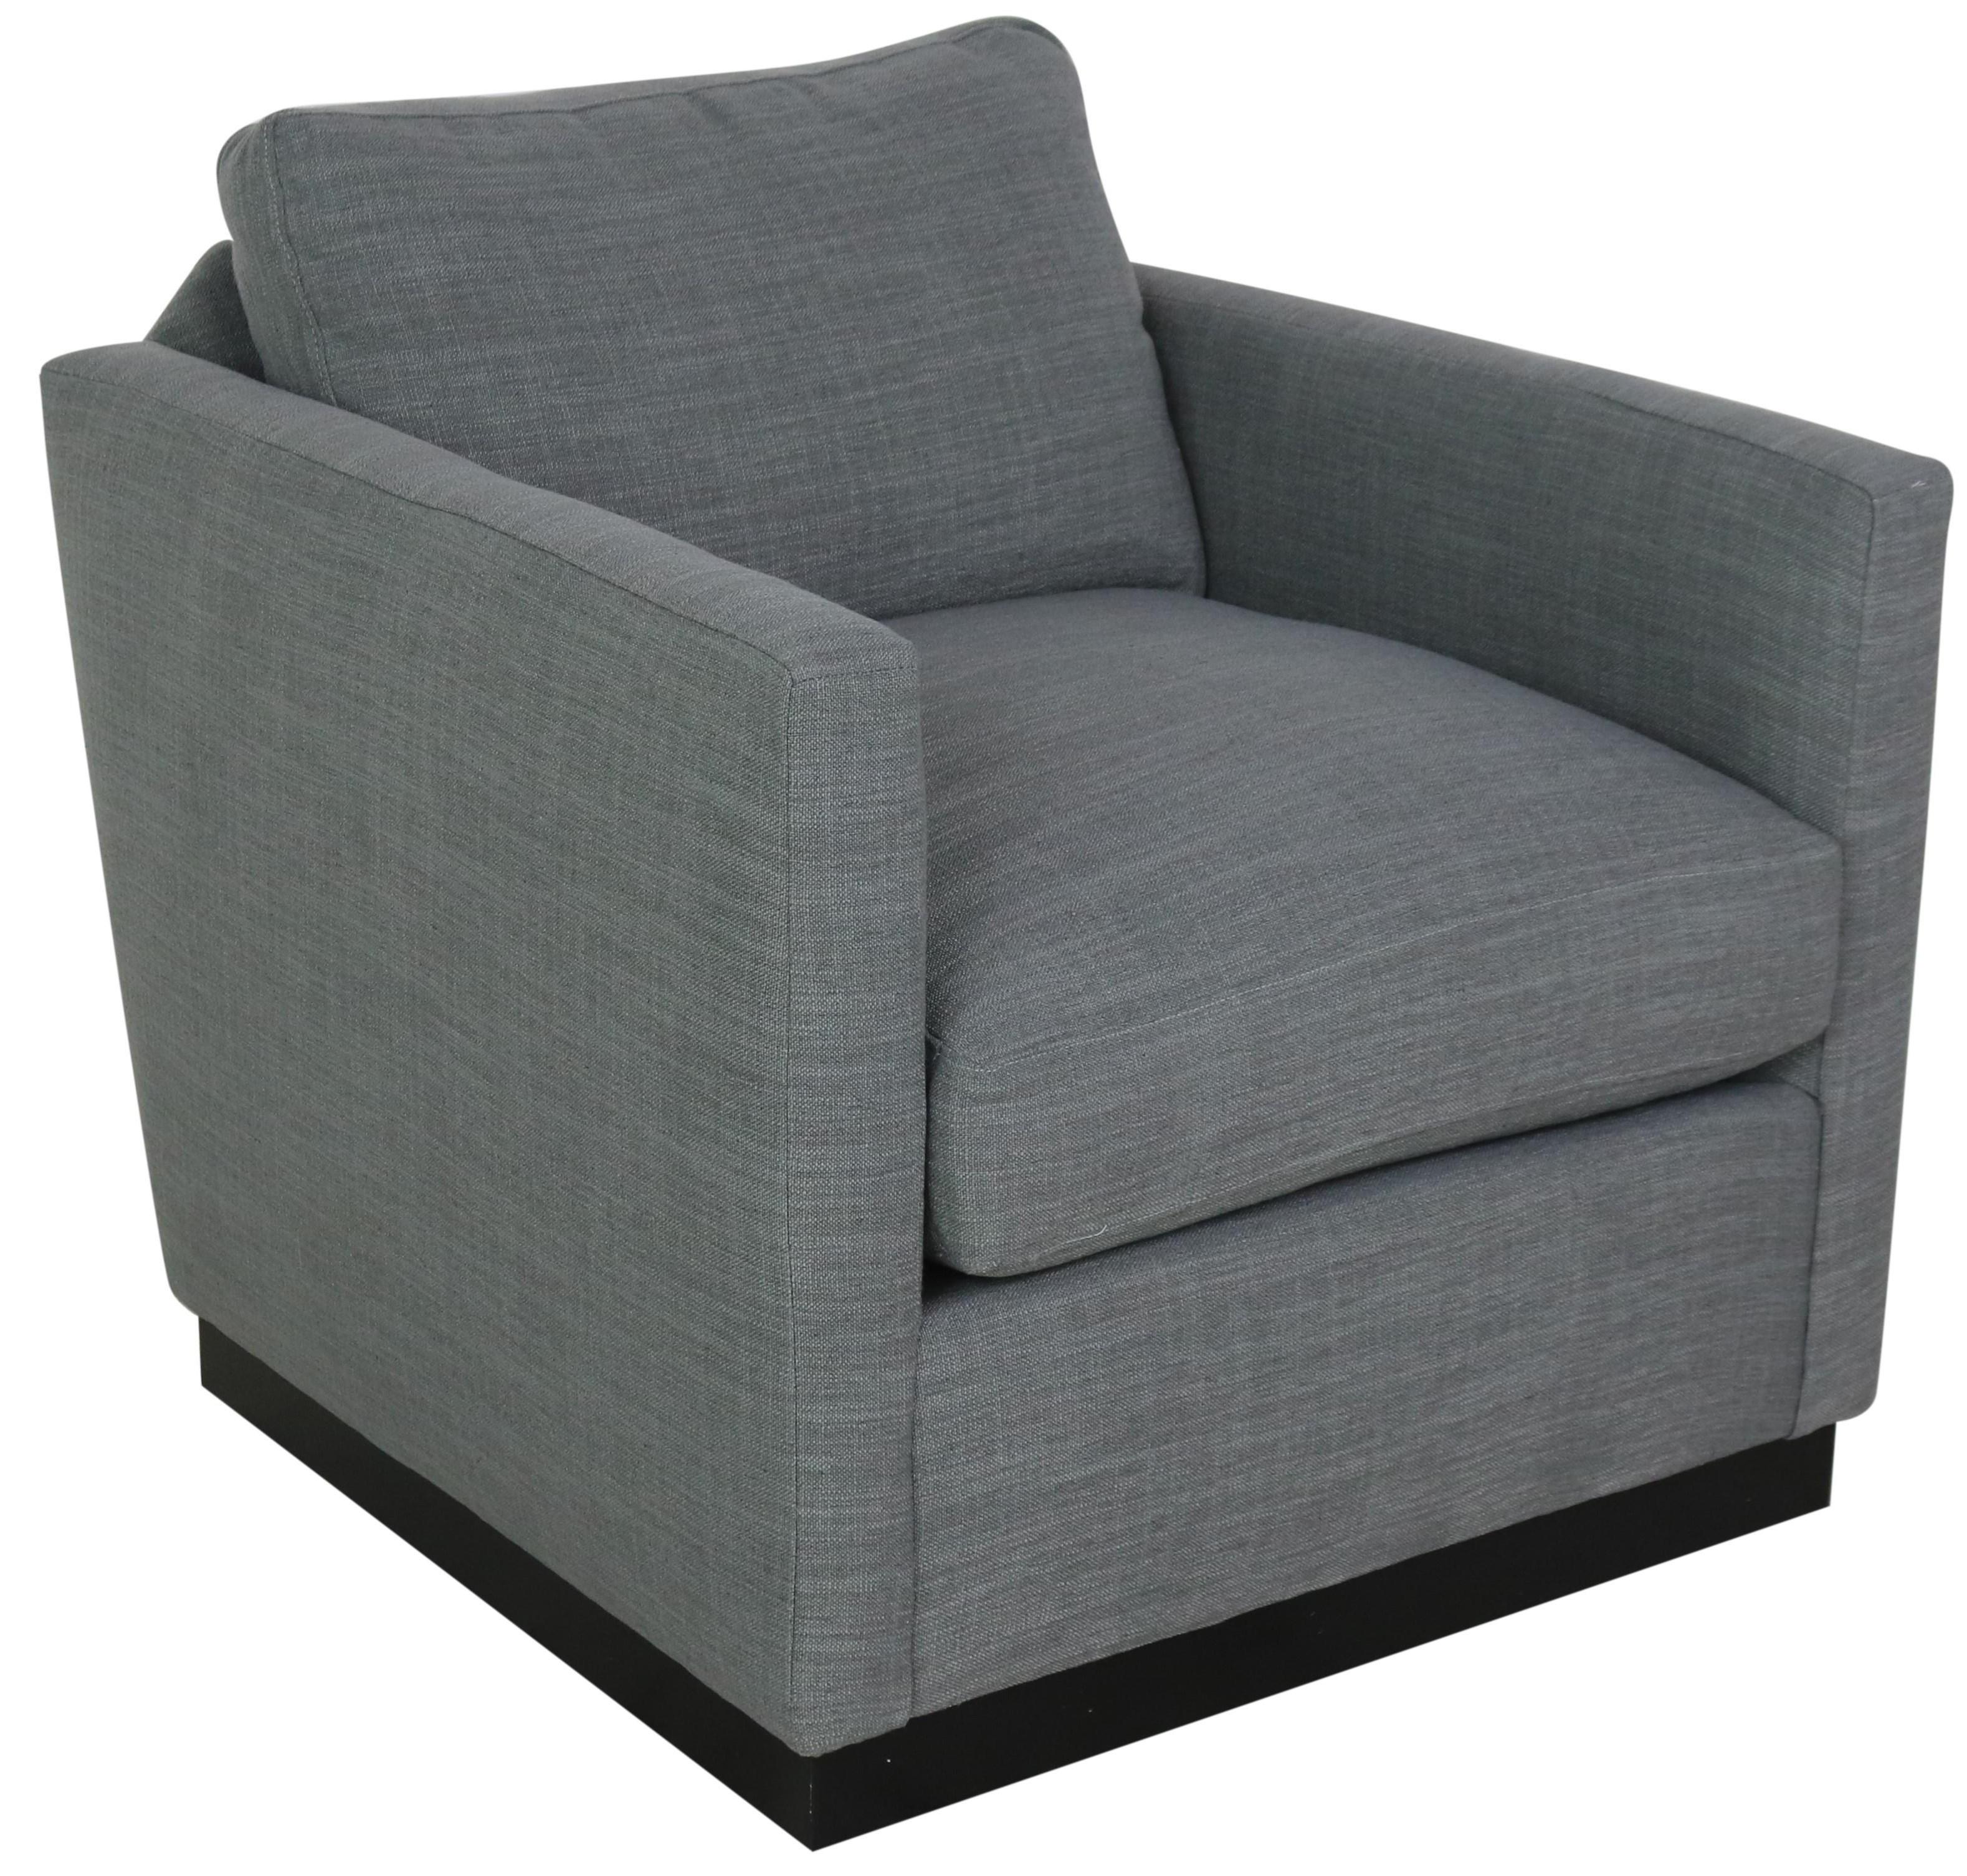 Allie Swivel Chair by Robin Bruce at Sprintz Furniture